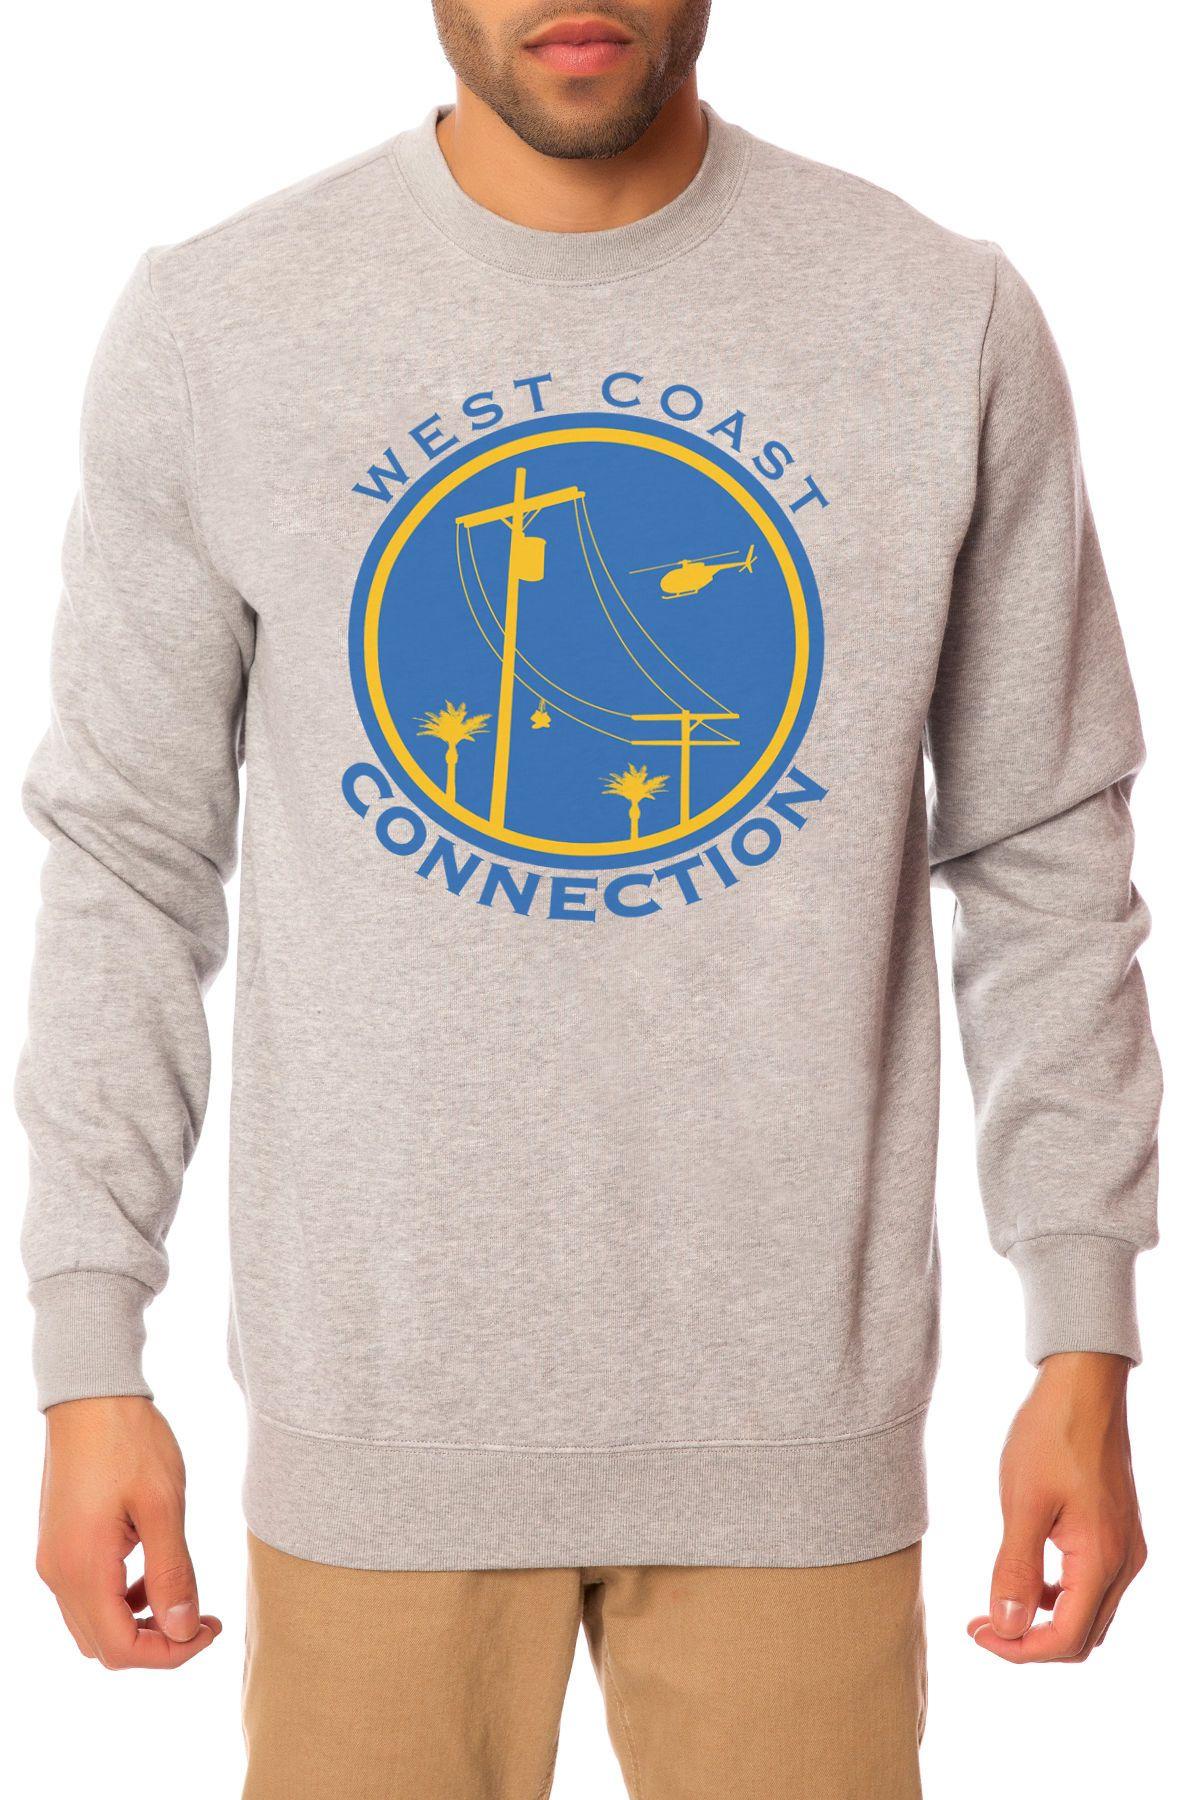 The West Coast Connection Crewneck Sweatshirt in Heather Grey